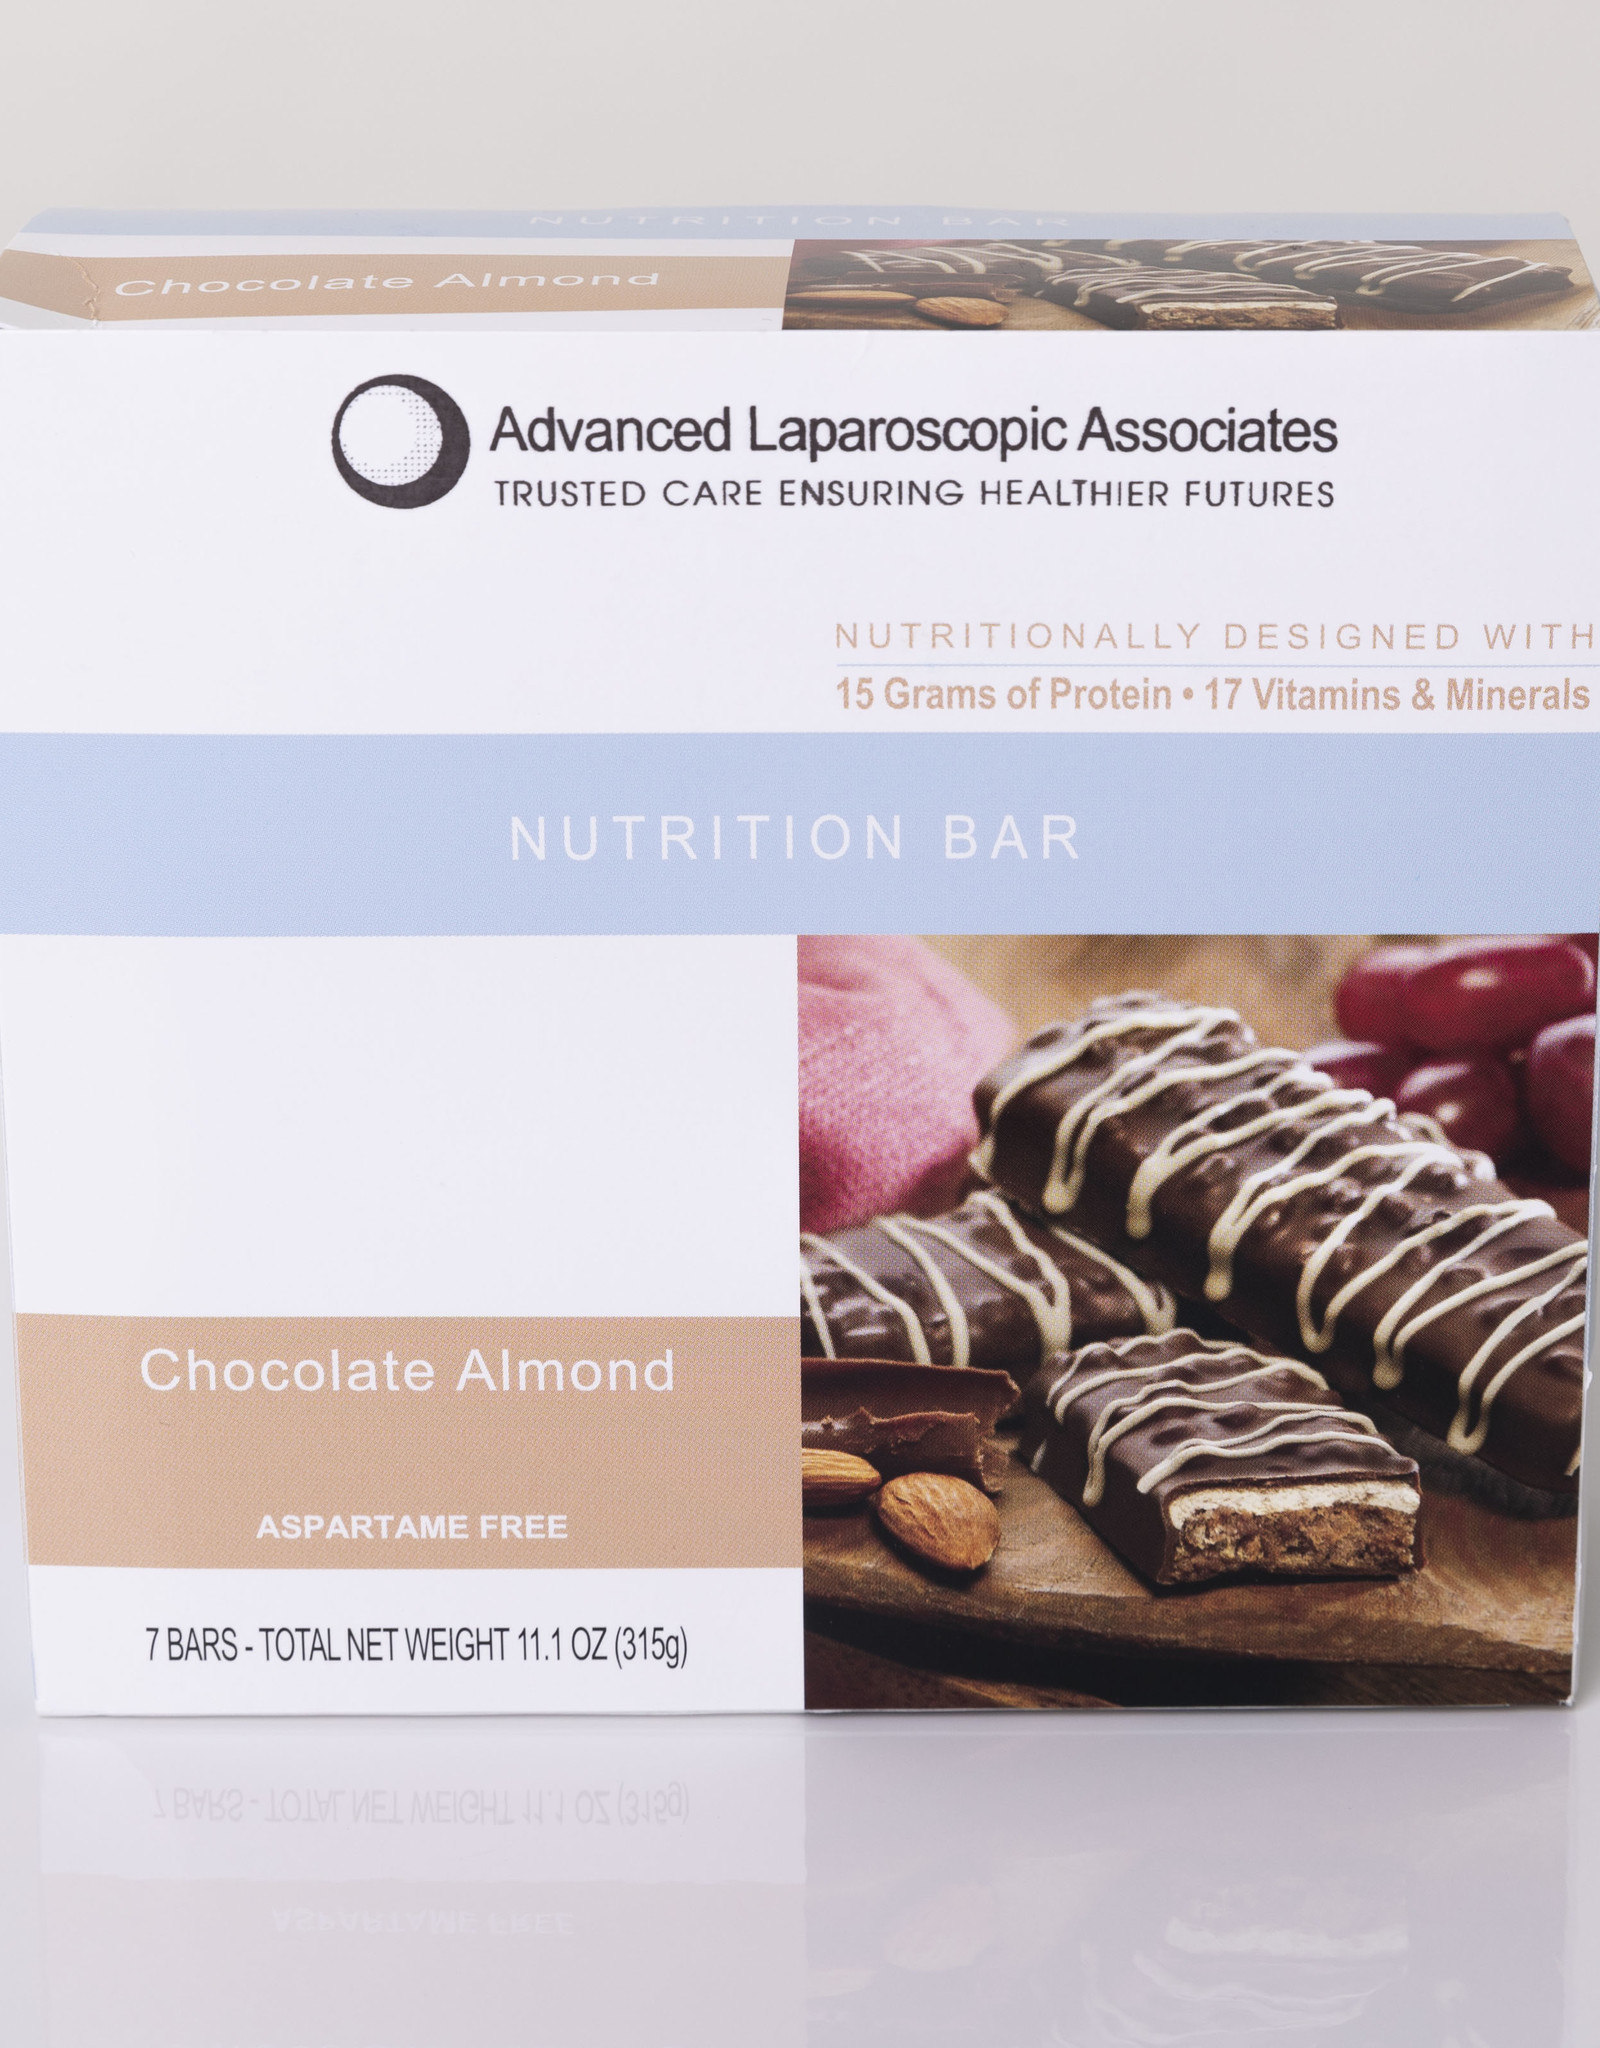 Advanced Laparoscopic Associates Chocolate Almond Bar